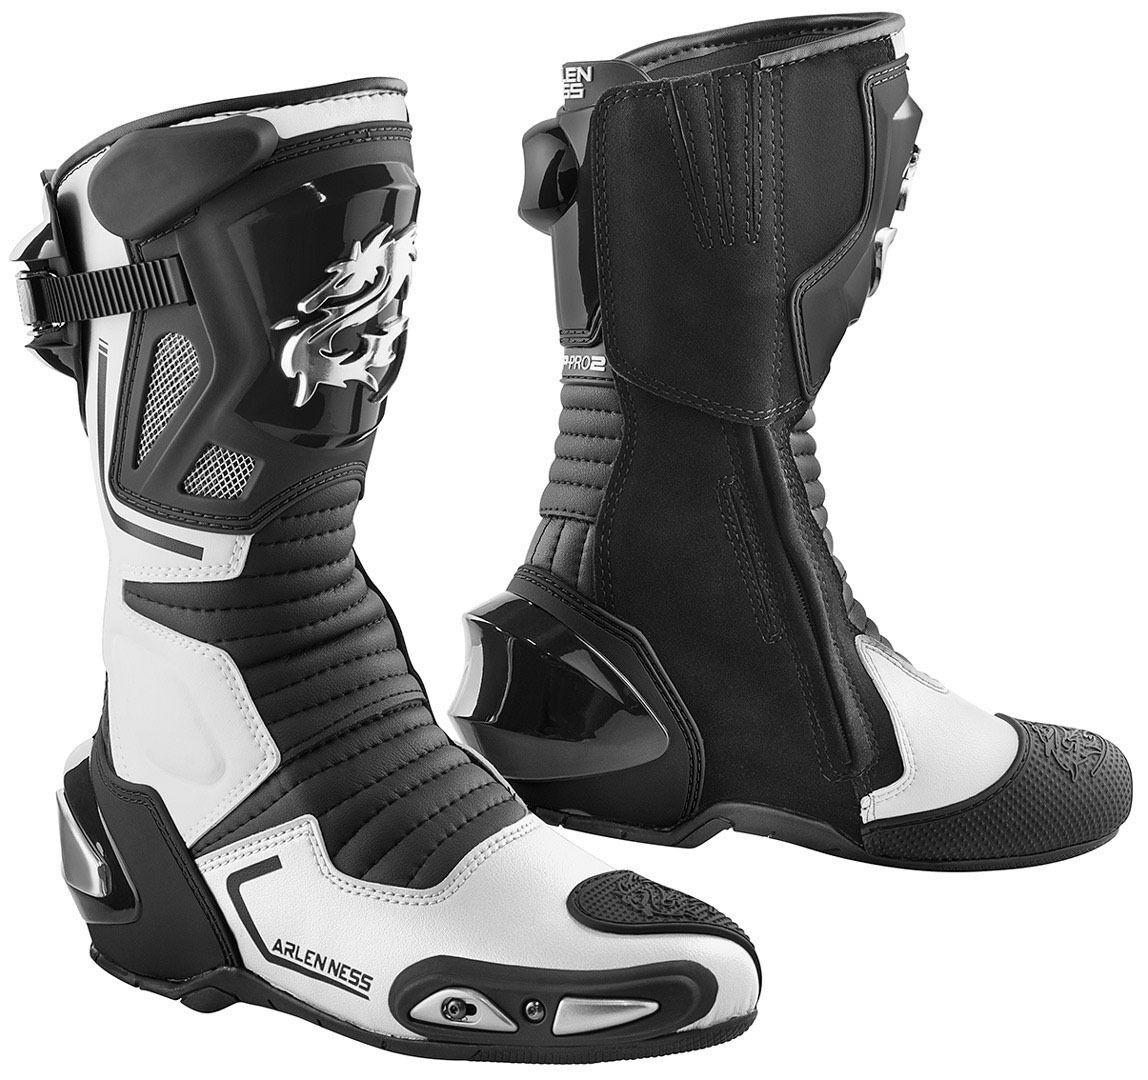 Arlen Ness Sugello Bottes de moto Noir Blanc taille : 40